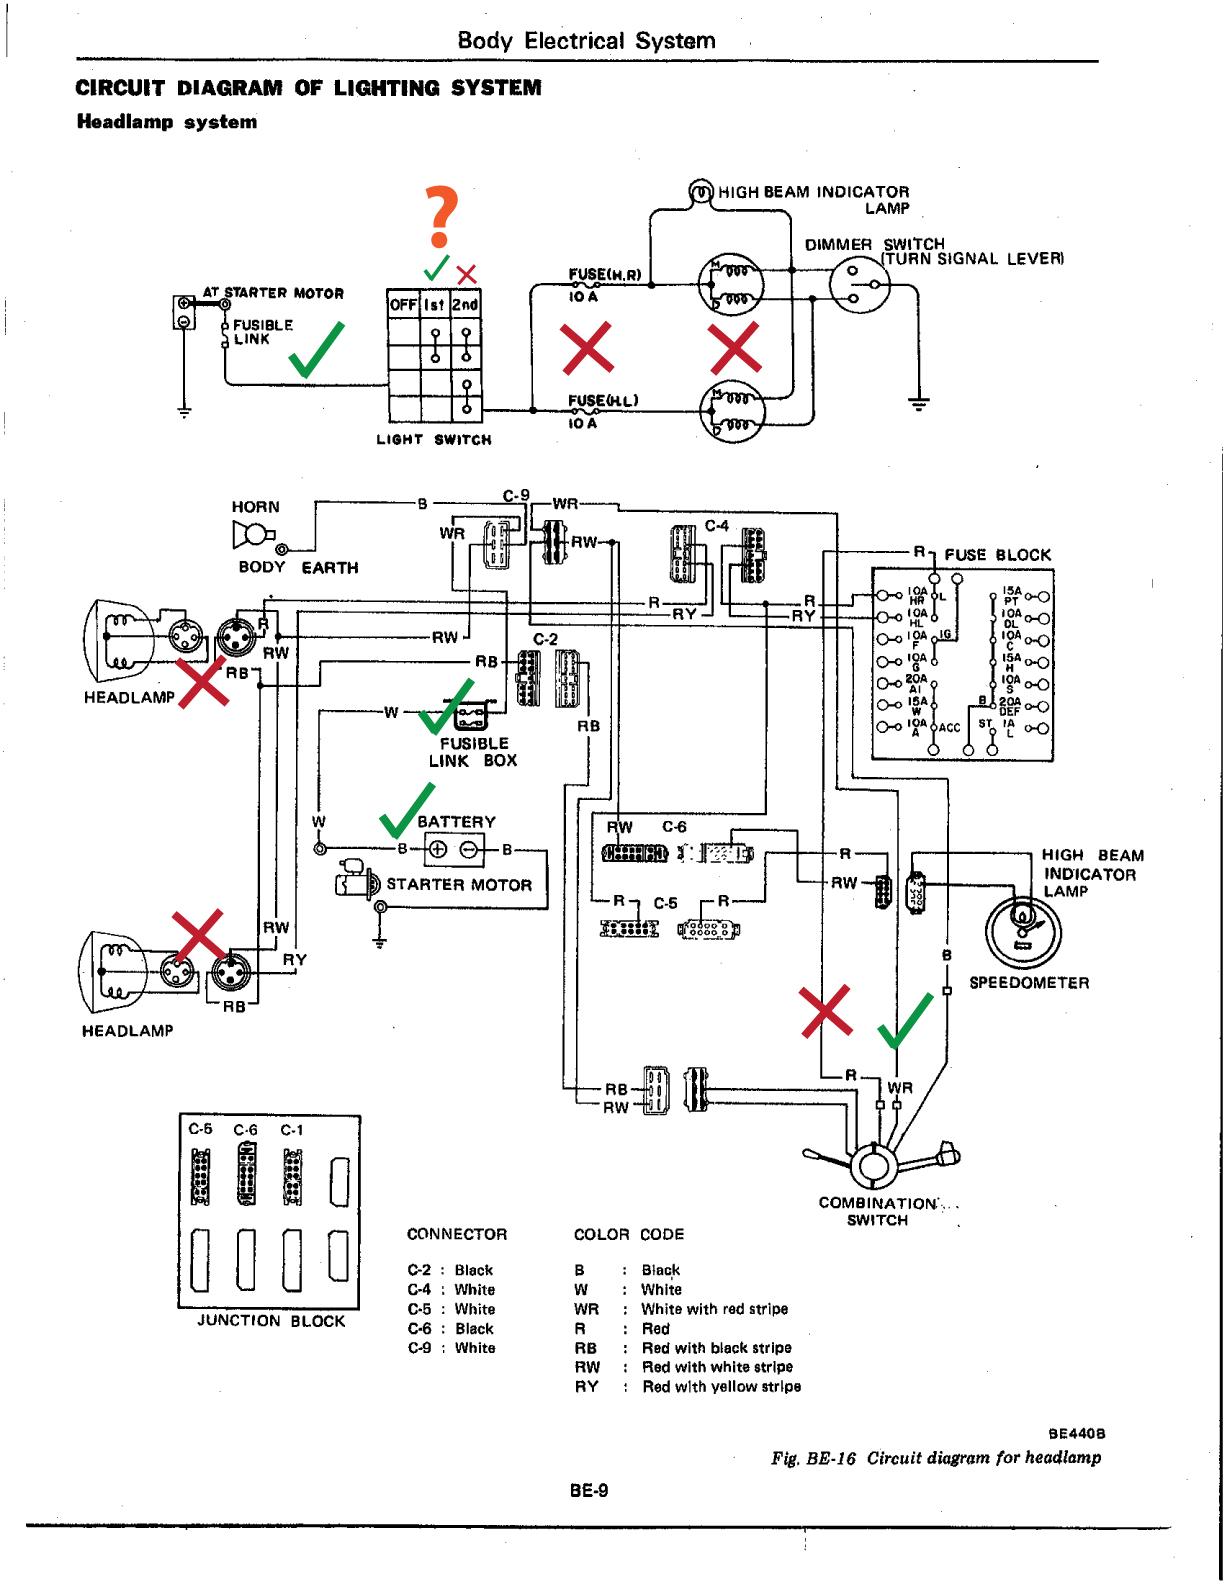 280z Ignition Switch Wiring Diagram | Wiring Diagram on